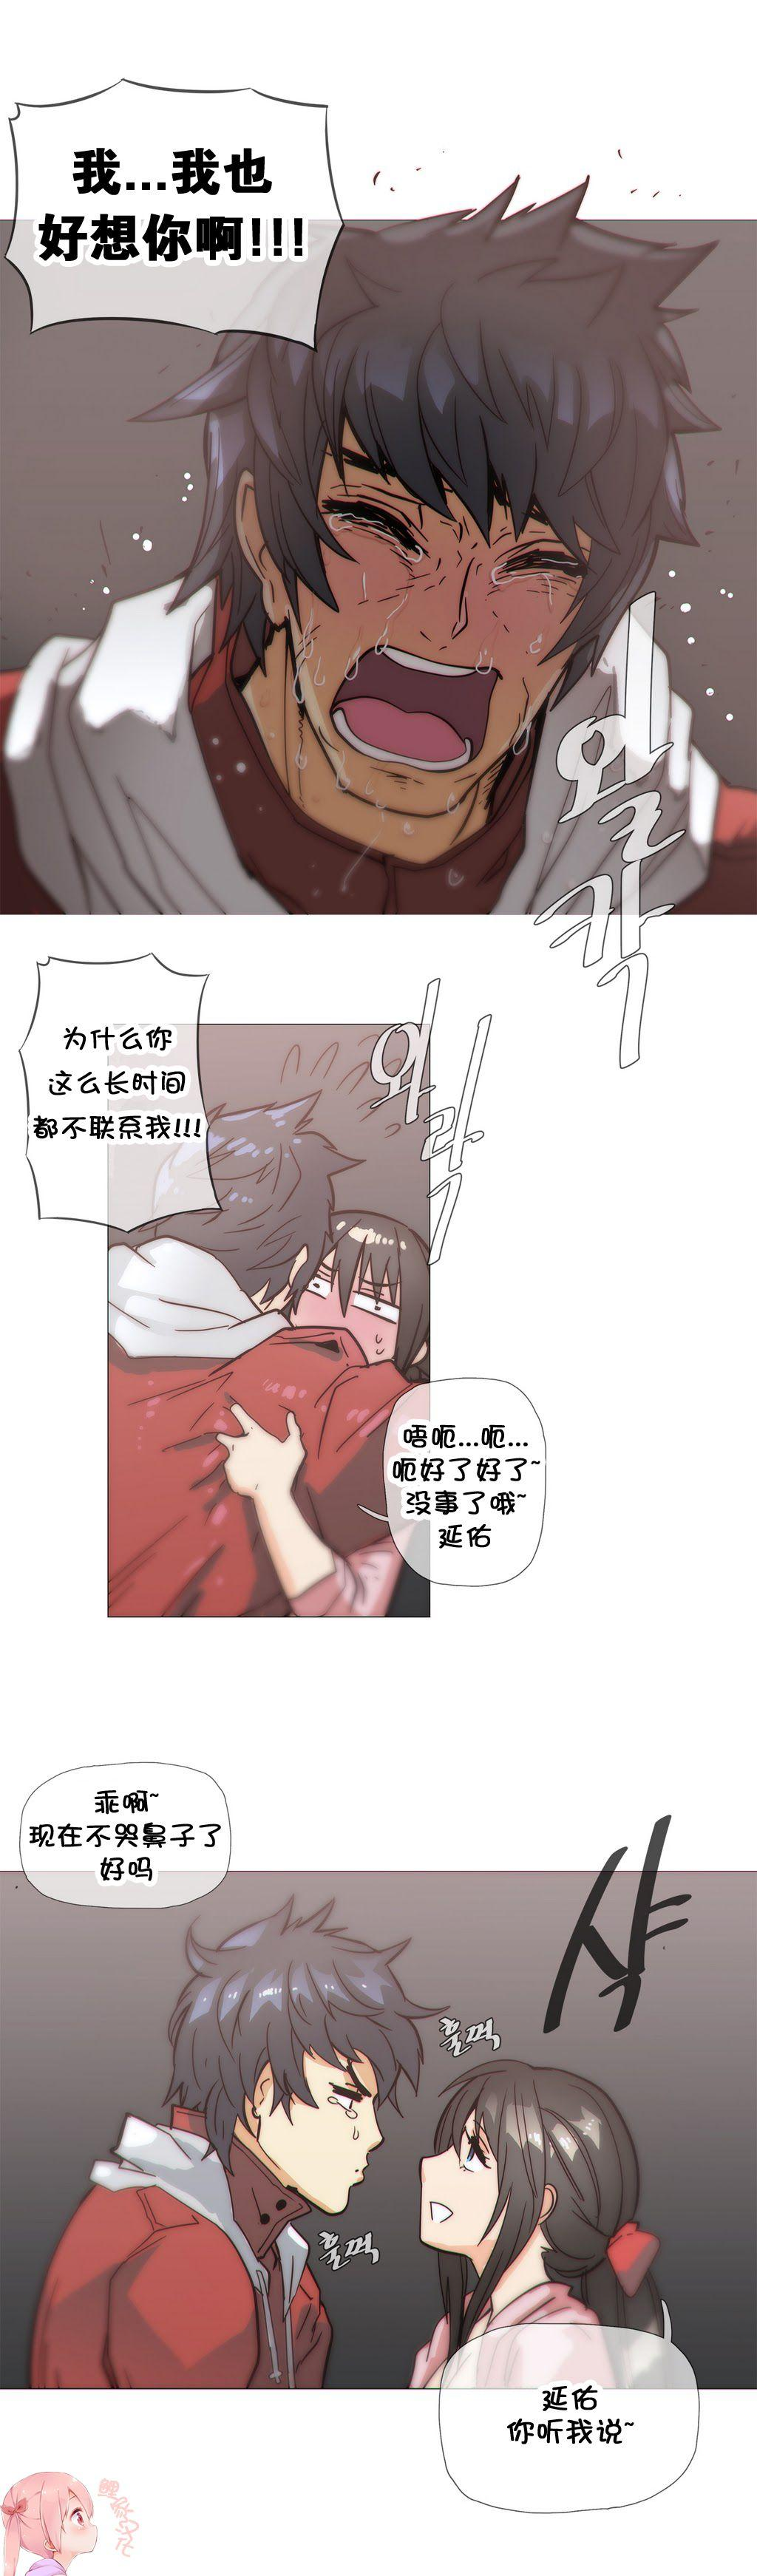 HouseHold Affairs 【卞赤鲤个人汉化】1~33话(持续更新中) 738